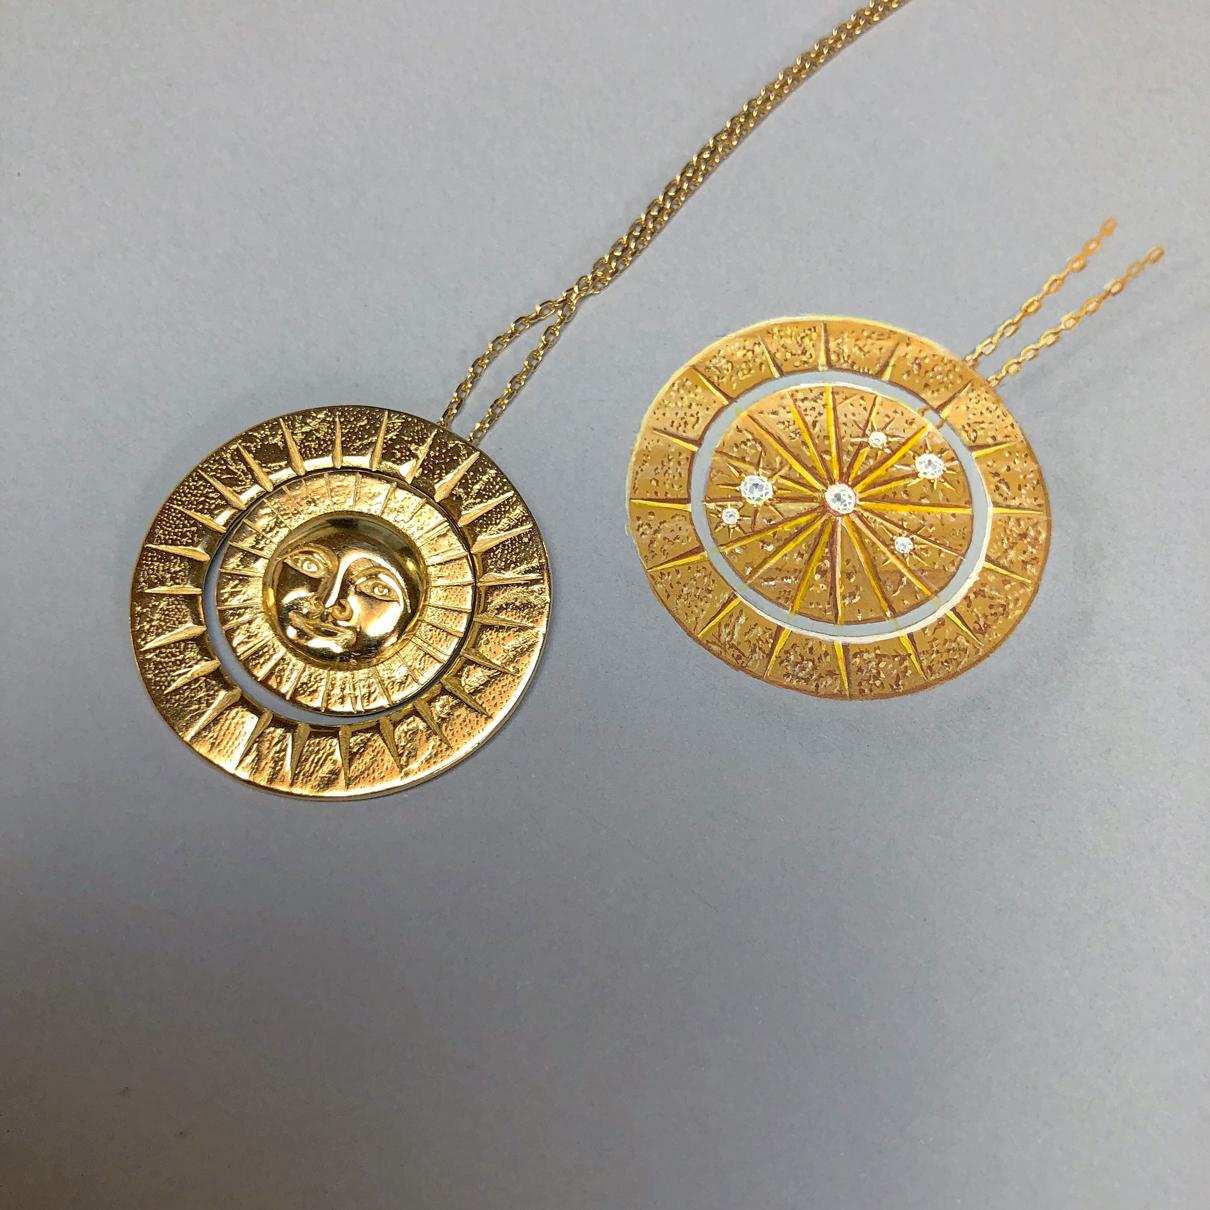 SUNMOON-VOJ-ClaraJasmine_Collier-medaille-sautoir-necklace-gold-vermeil-diamant-drawing-web.jpg